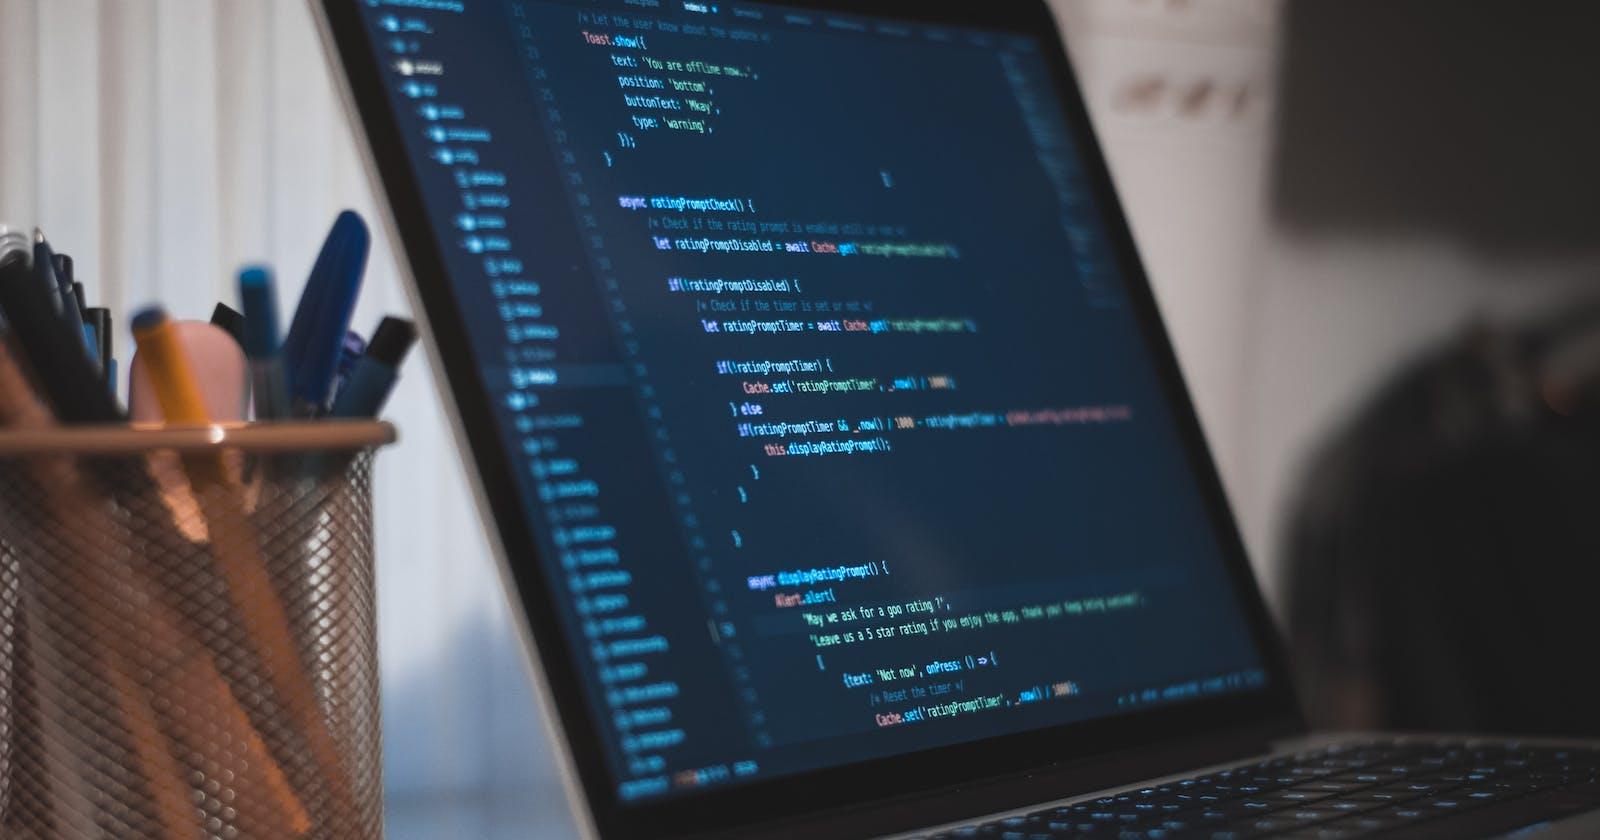 Web development technologies I want to learn in 2021